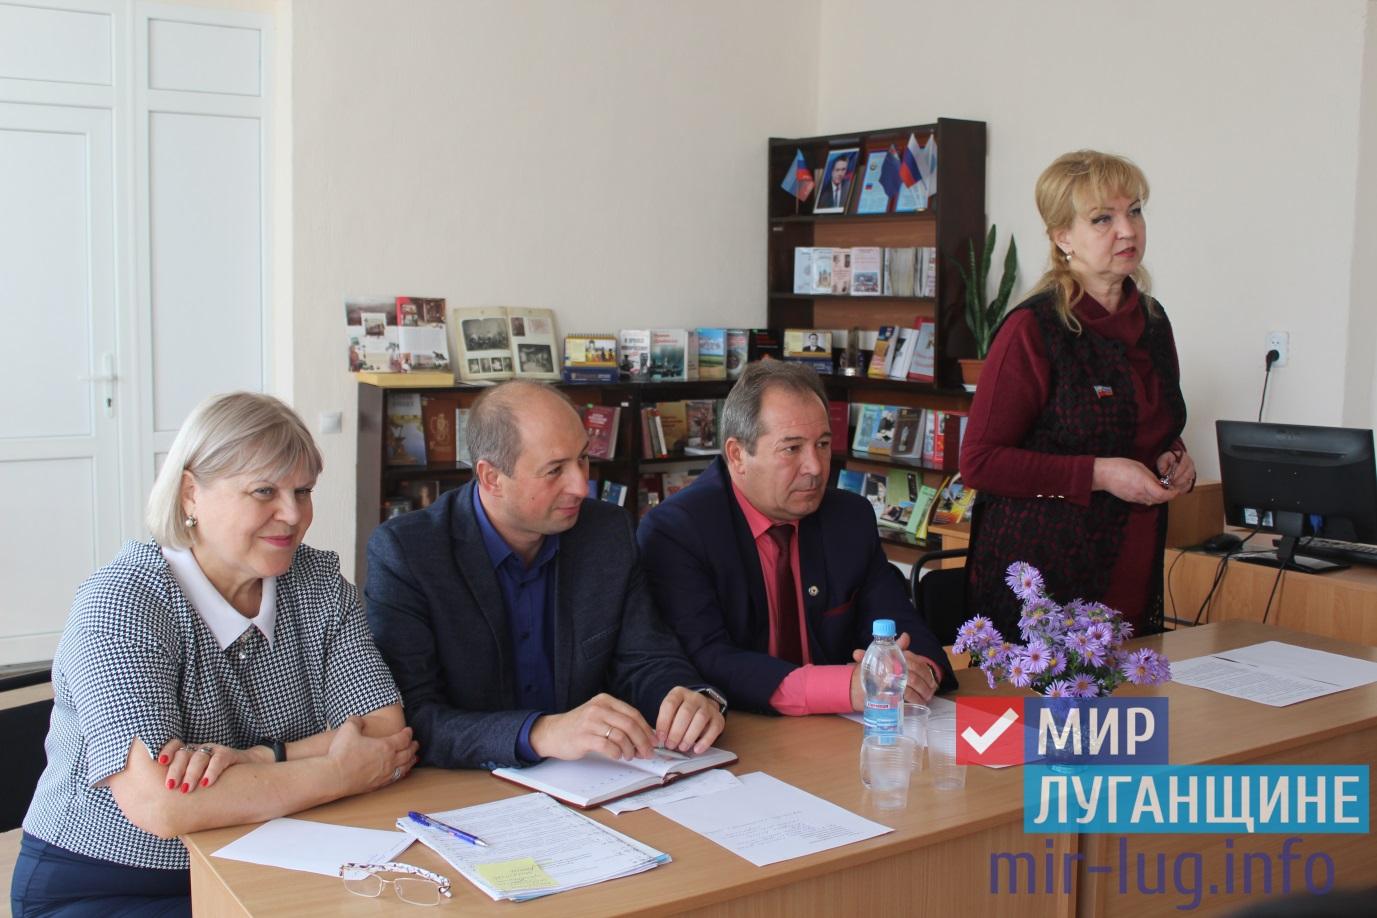 Депутат Народного Совета встретилась с педагогами Славяносербска 1